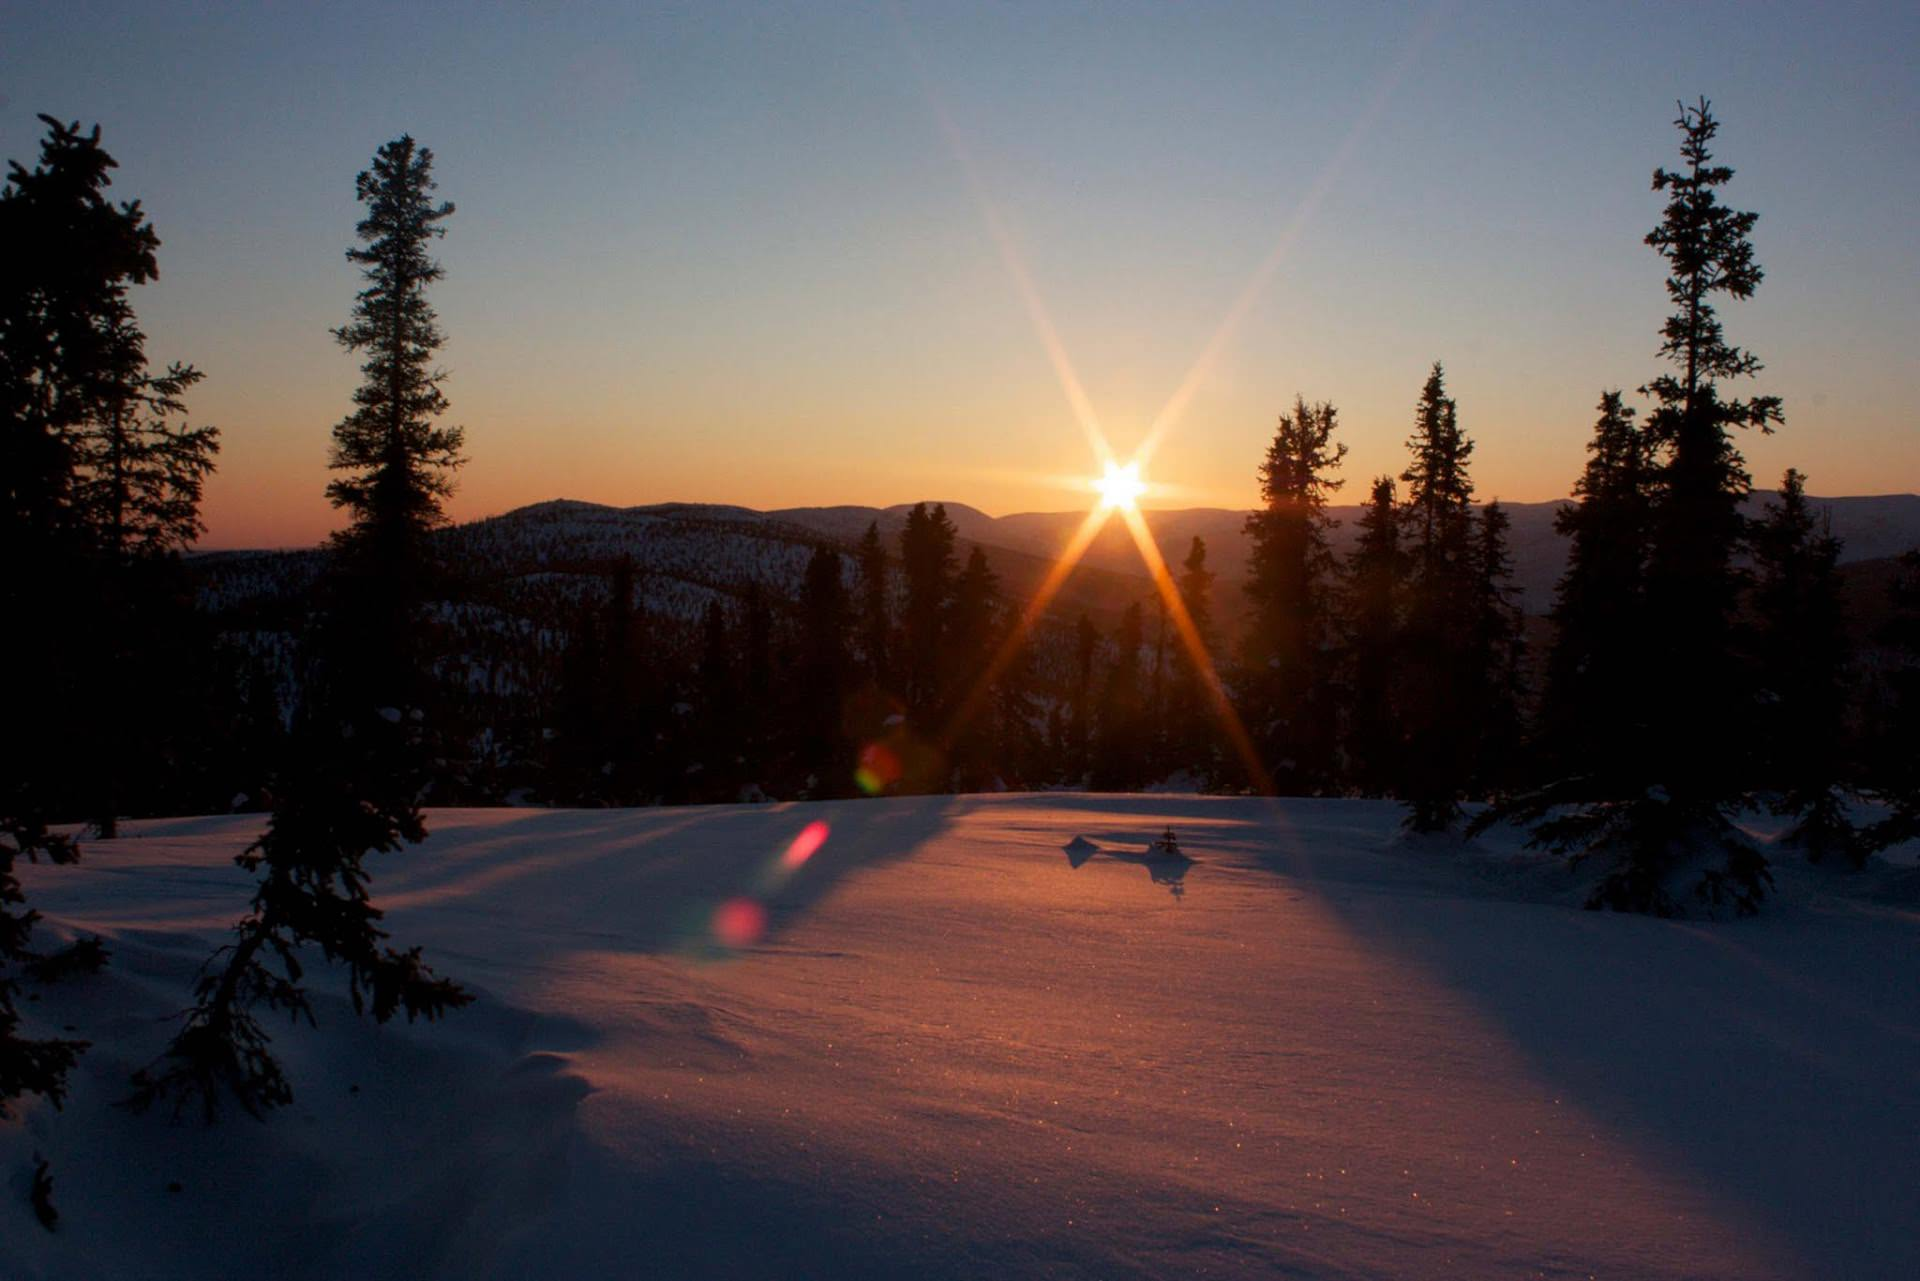 Alaska 2 image